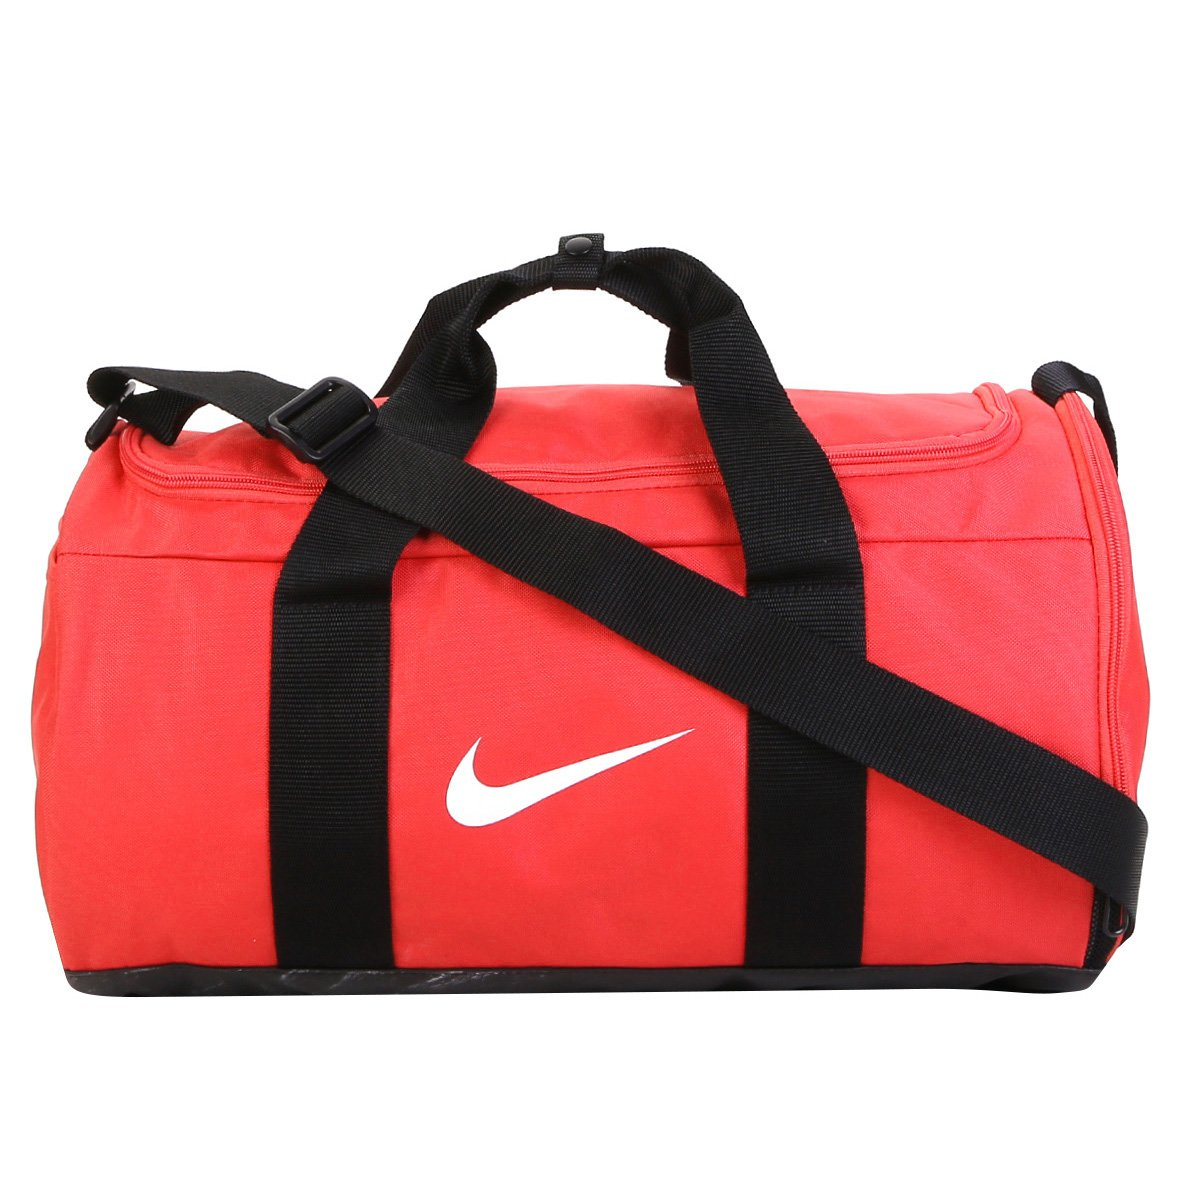 9c209333f Mala Nike Team - Vermelho | Loja do Inter